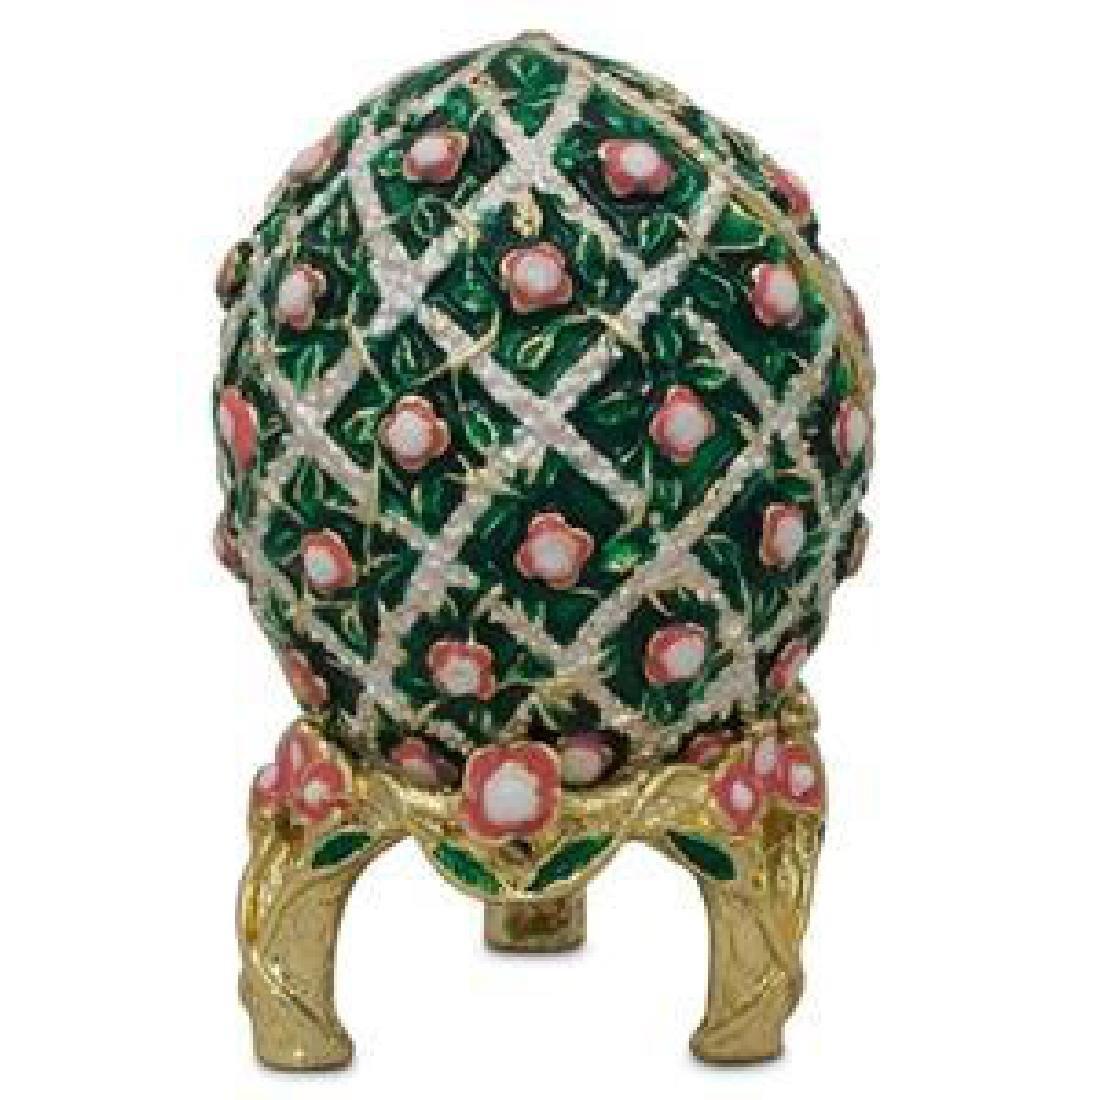 1907 Rose Trellis Russian Faberge Egg